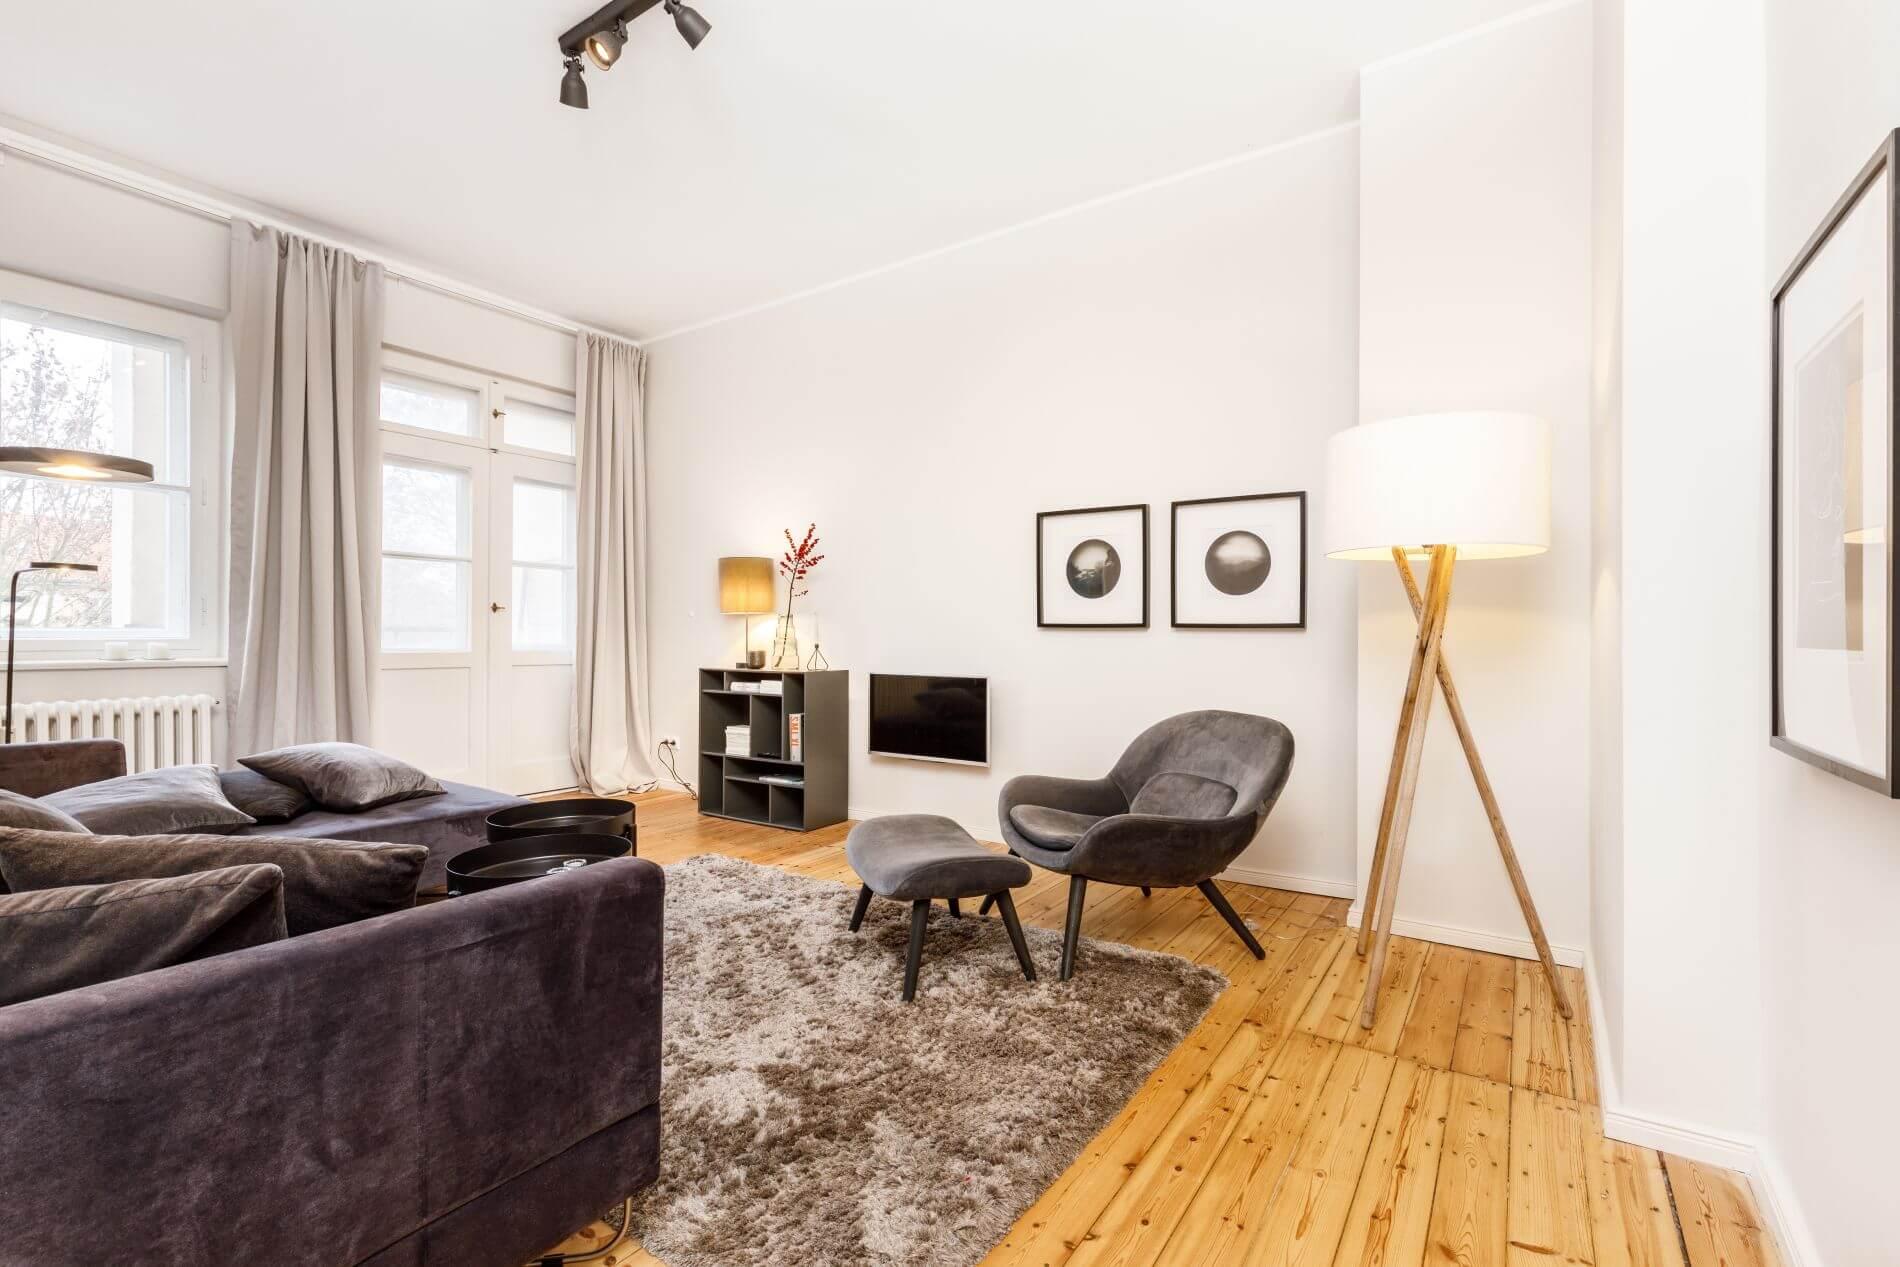 Modern design serviced apartment near Free University Berlin that allos pets